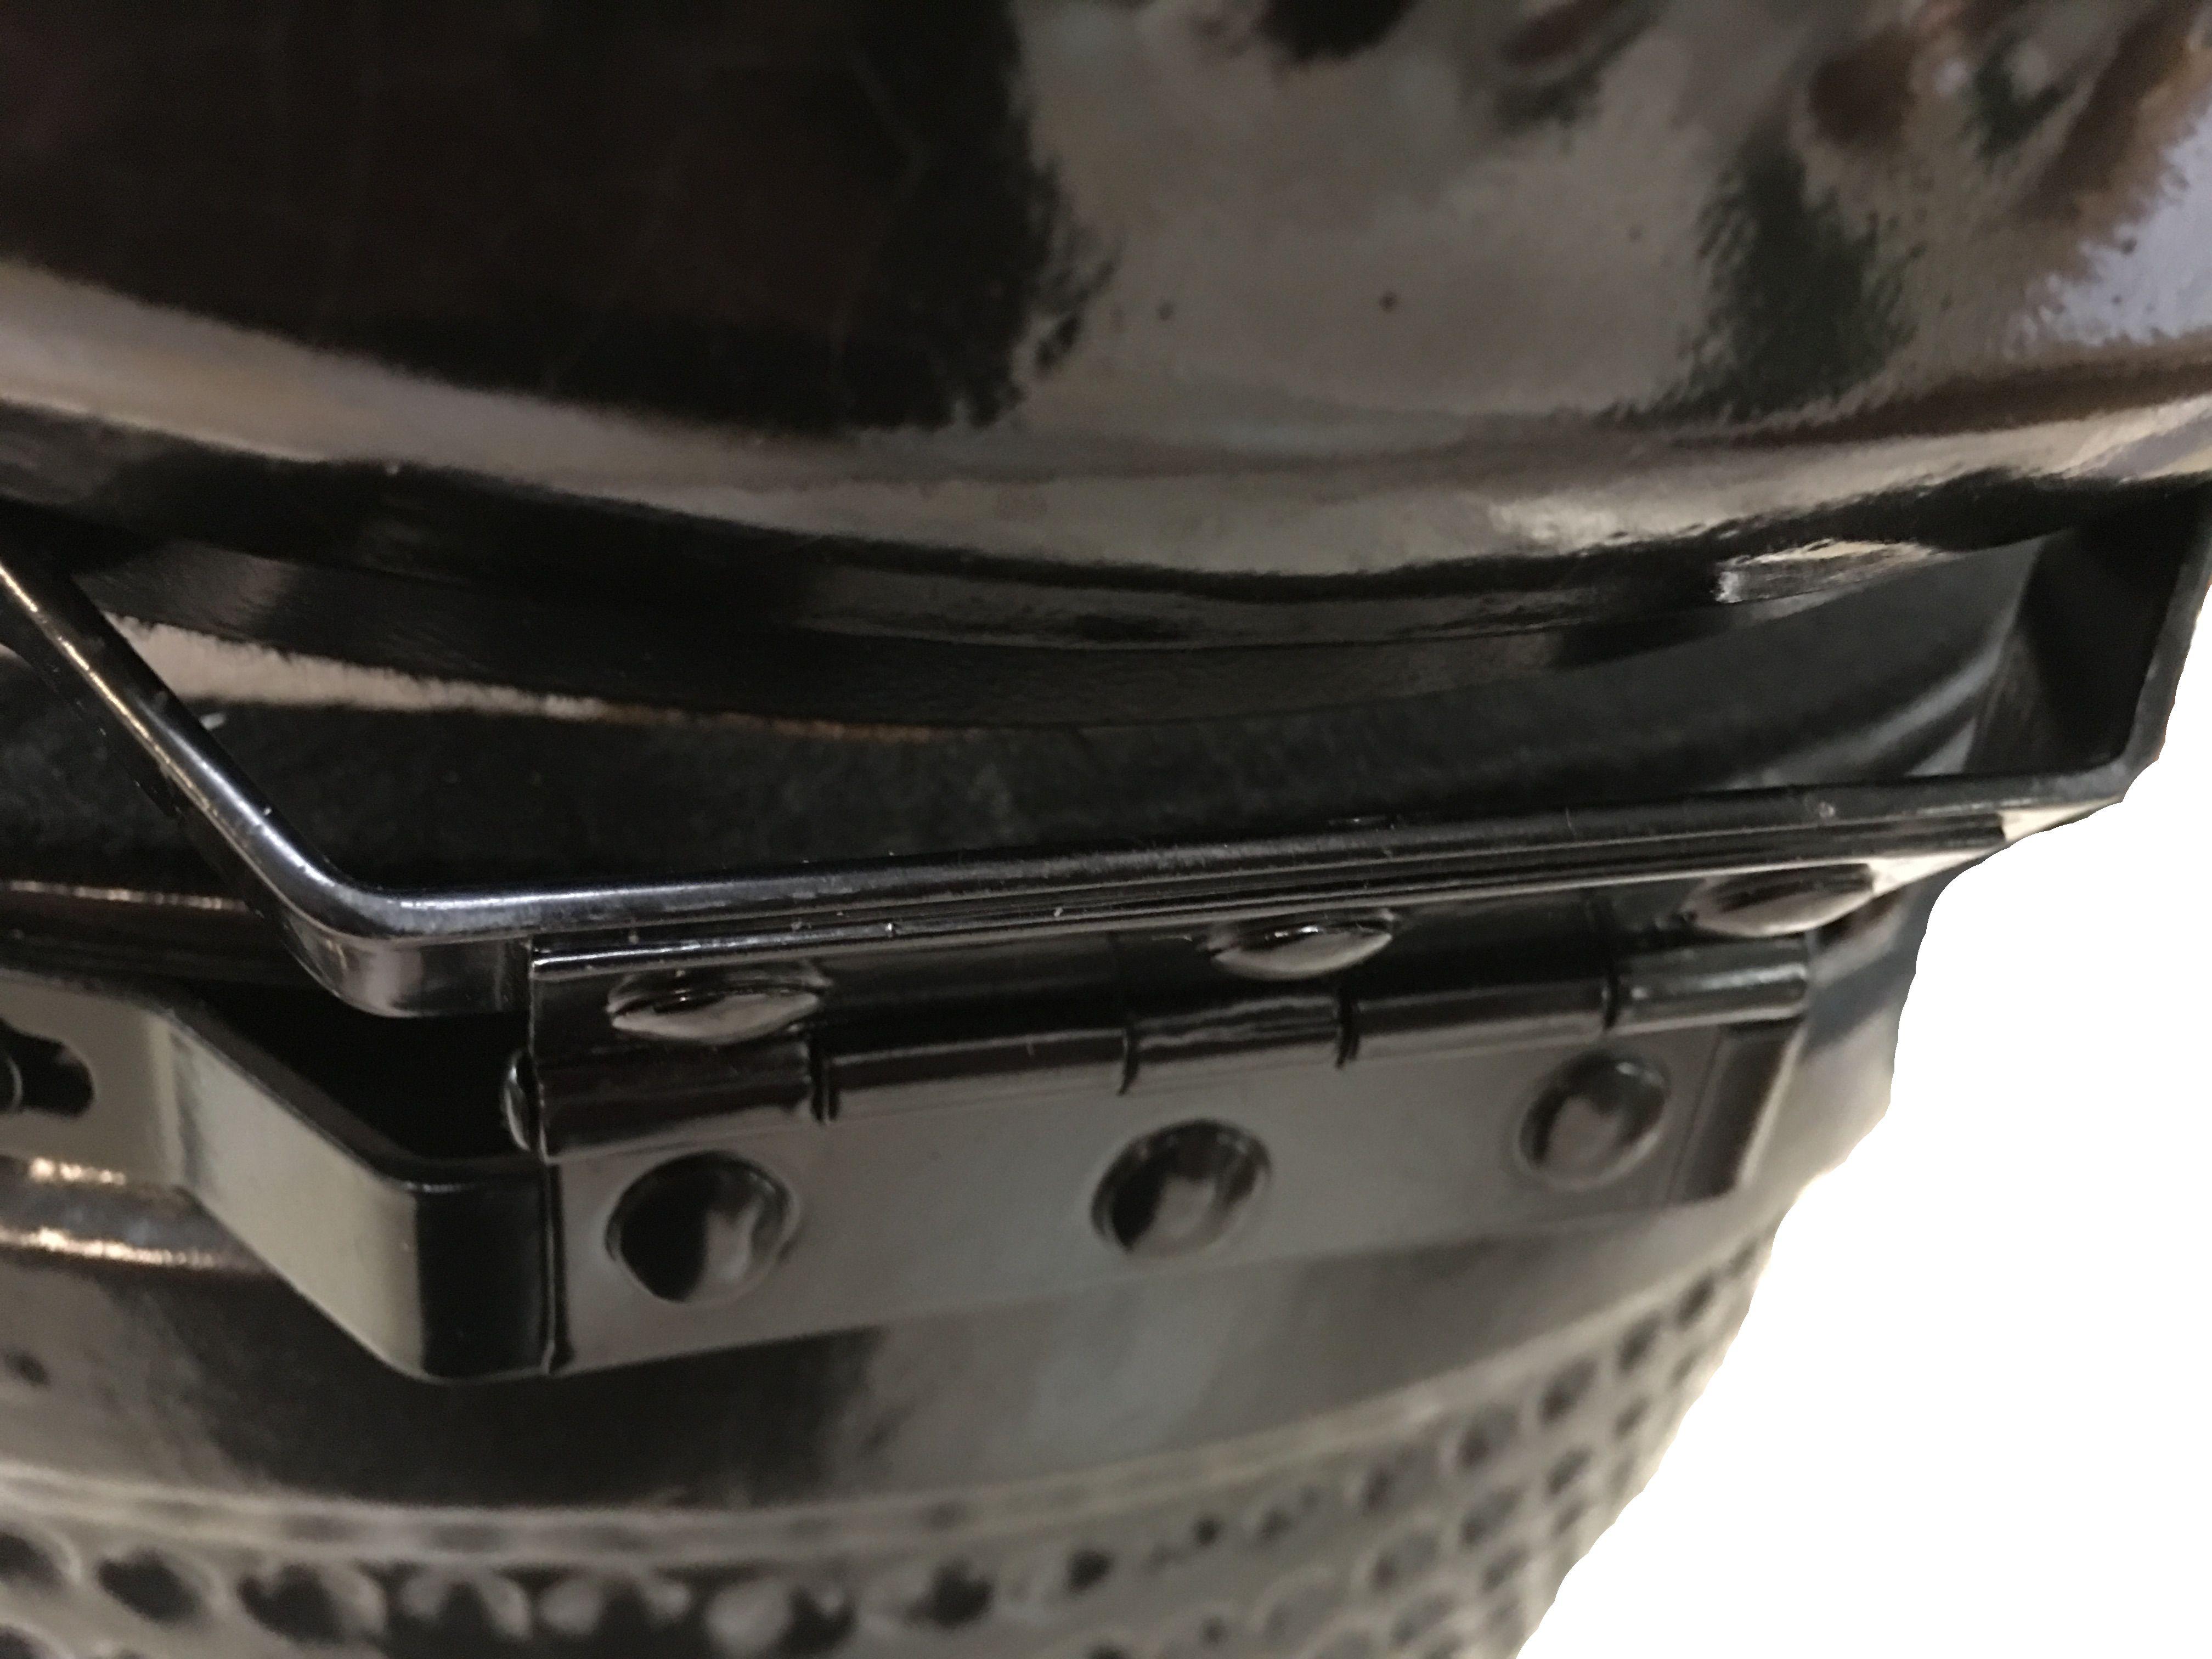 Kamado Action 13-Zoll schwarz Keramikgrill Bild 3